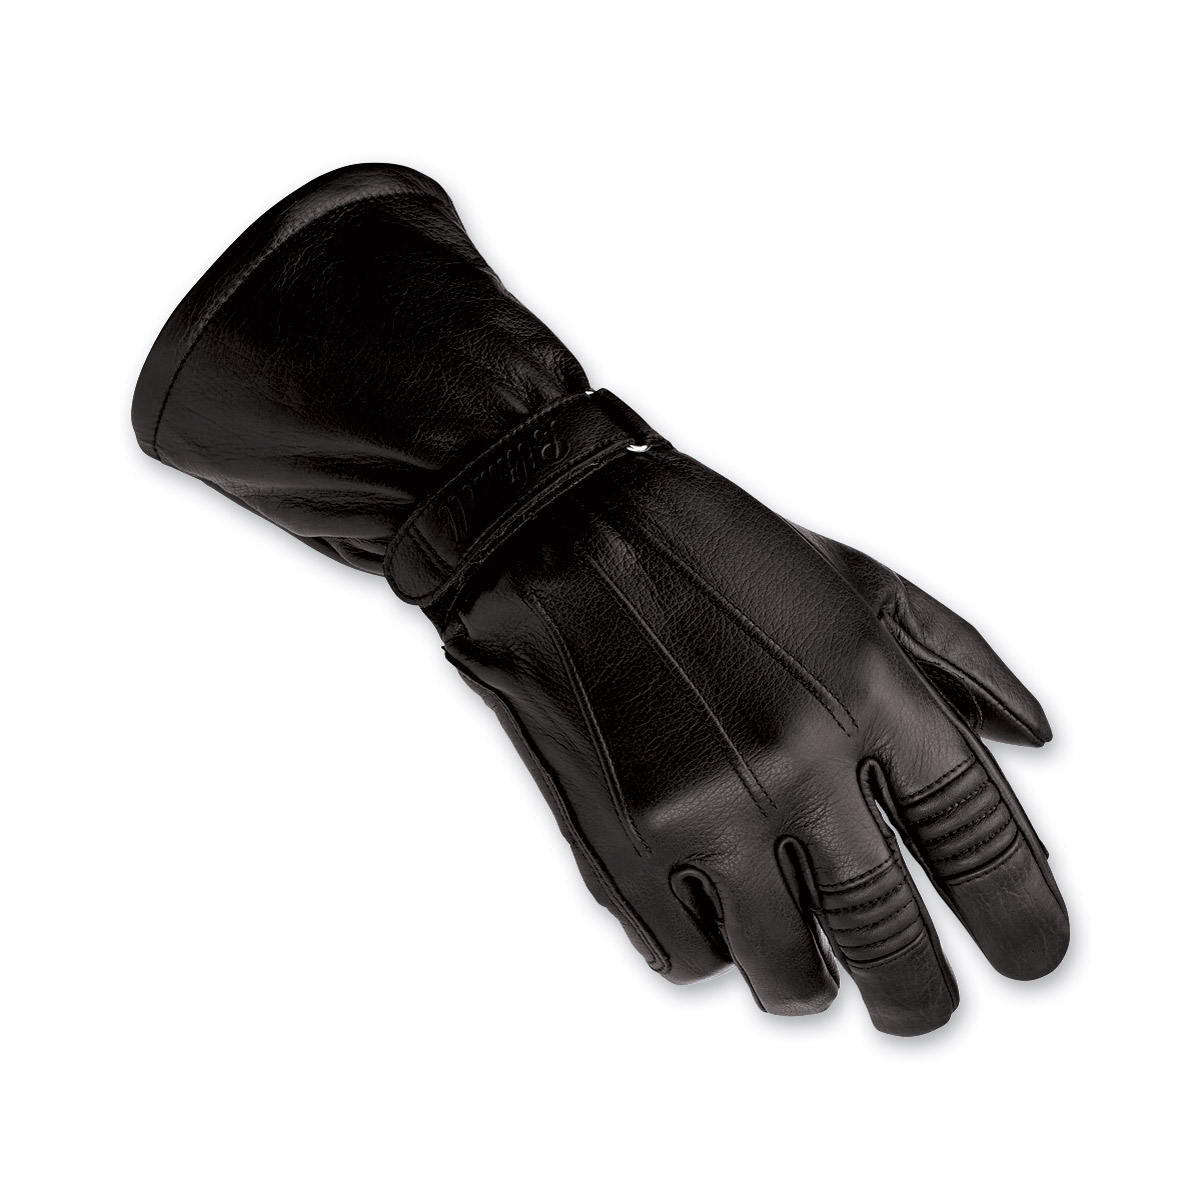 Biltwell Inc. Men's Black Gauntlet Gloves